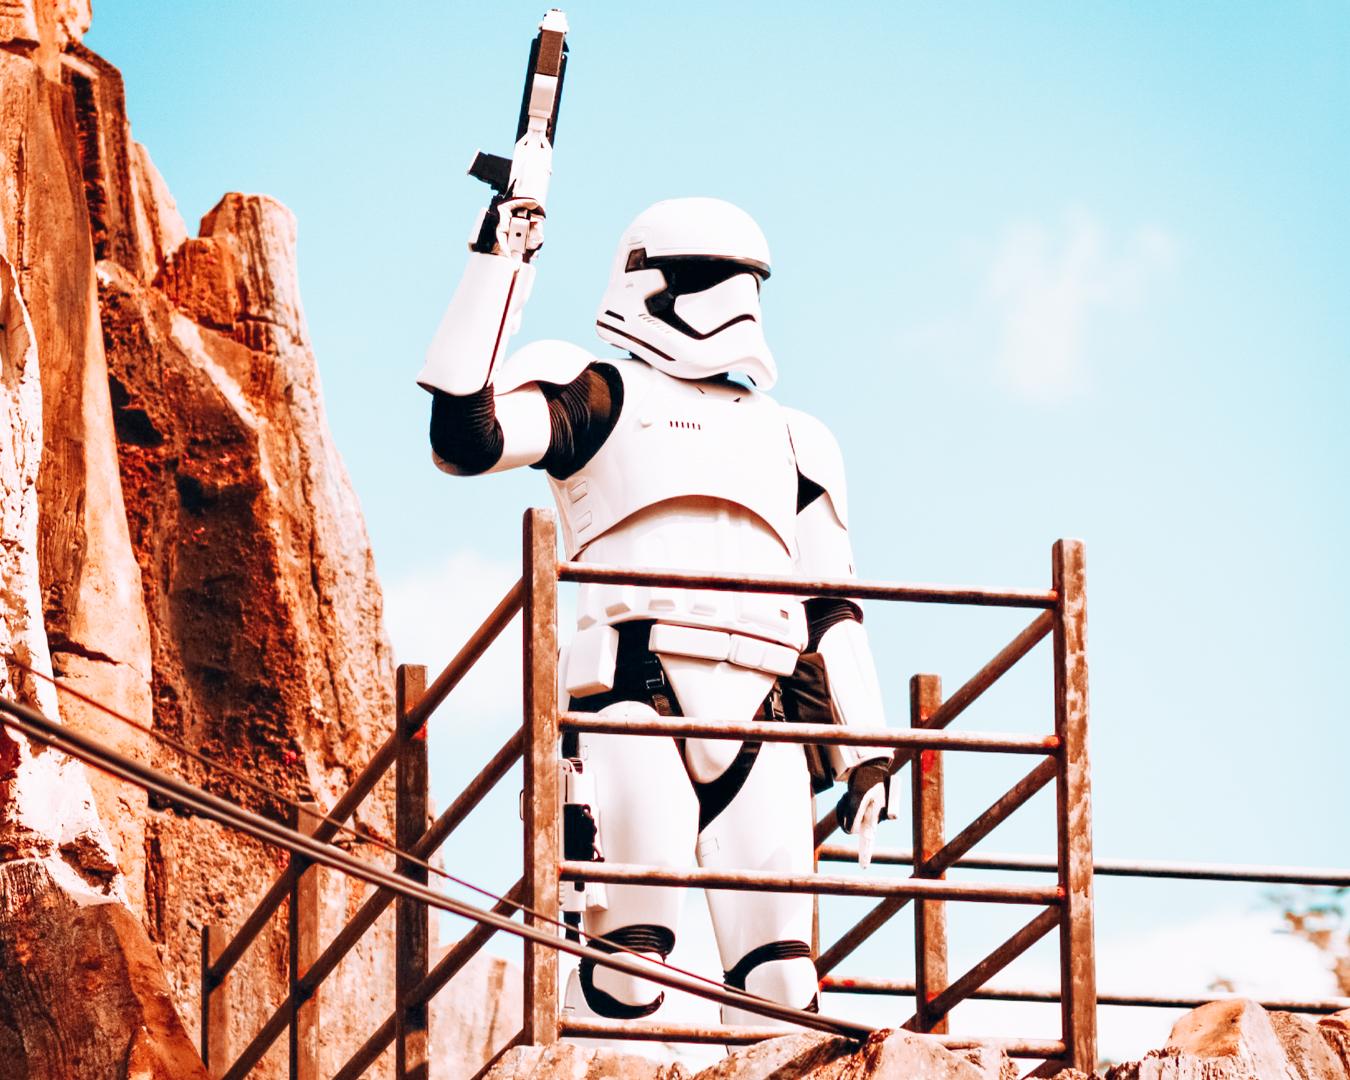 Storm trooper at Disney's Hollywood Studios